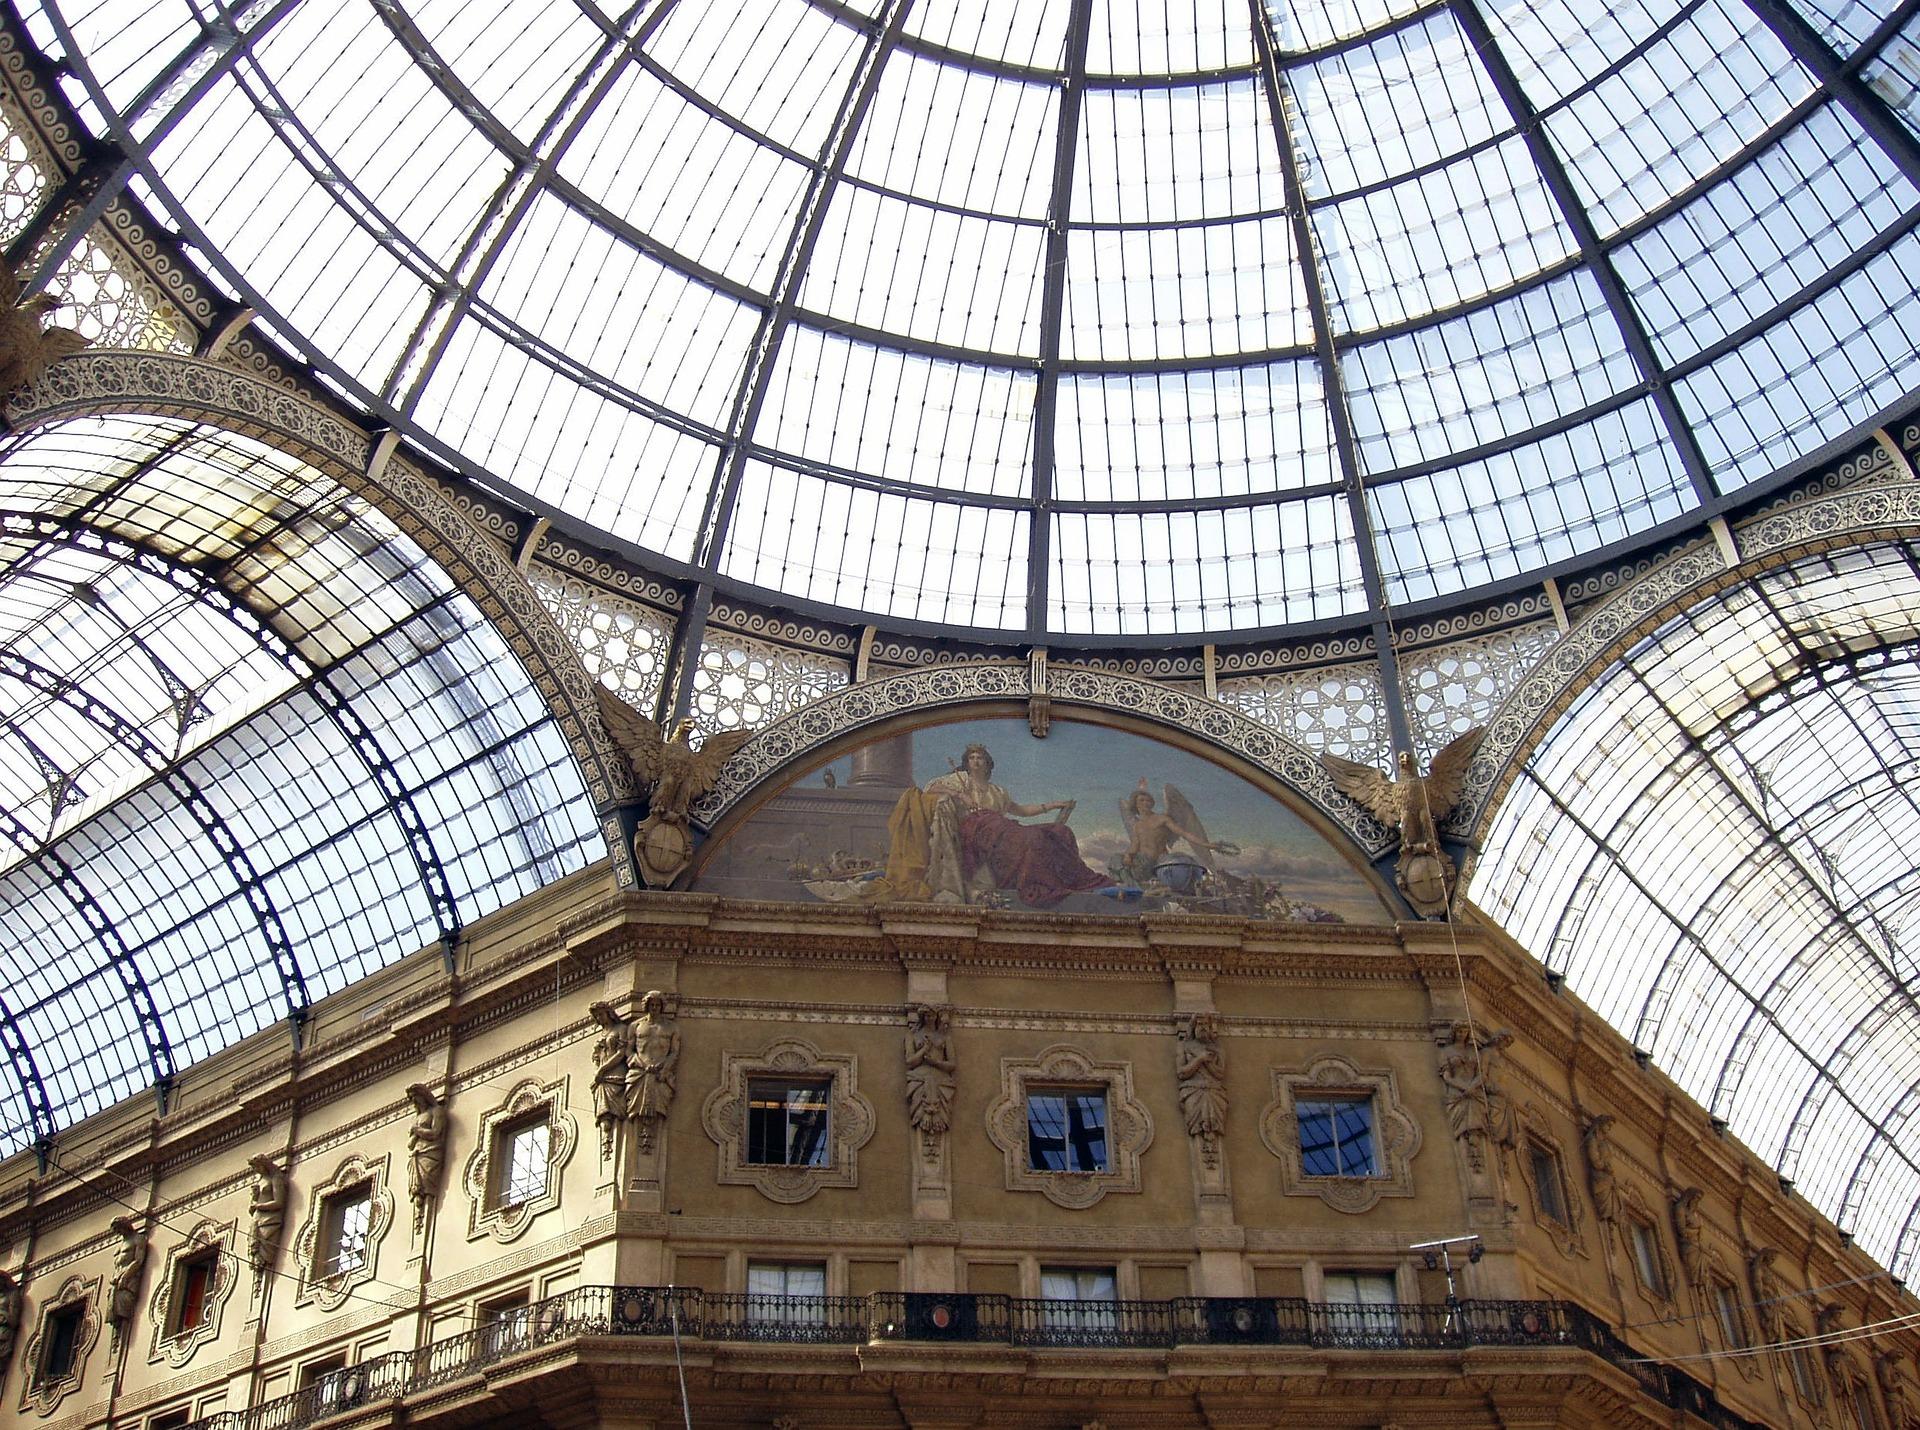 Галерея Виктора Эммануила II (Galleria Vittorio Emanuele II) в Милане